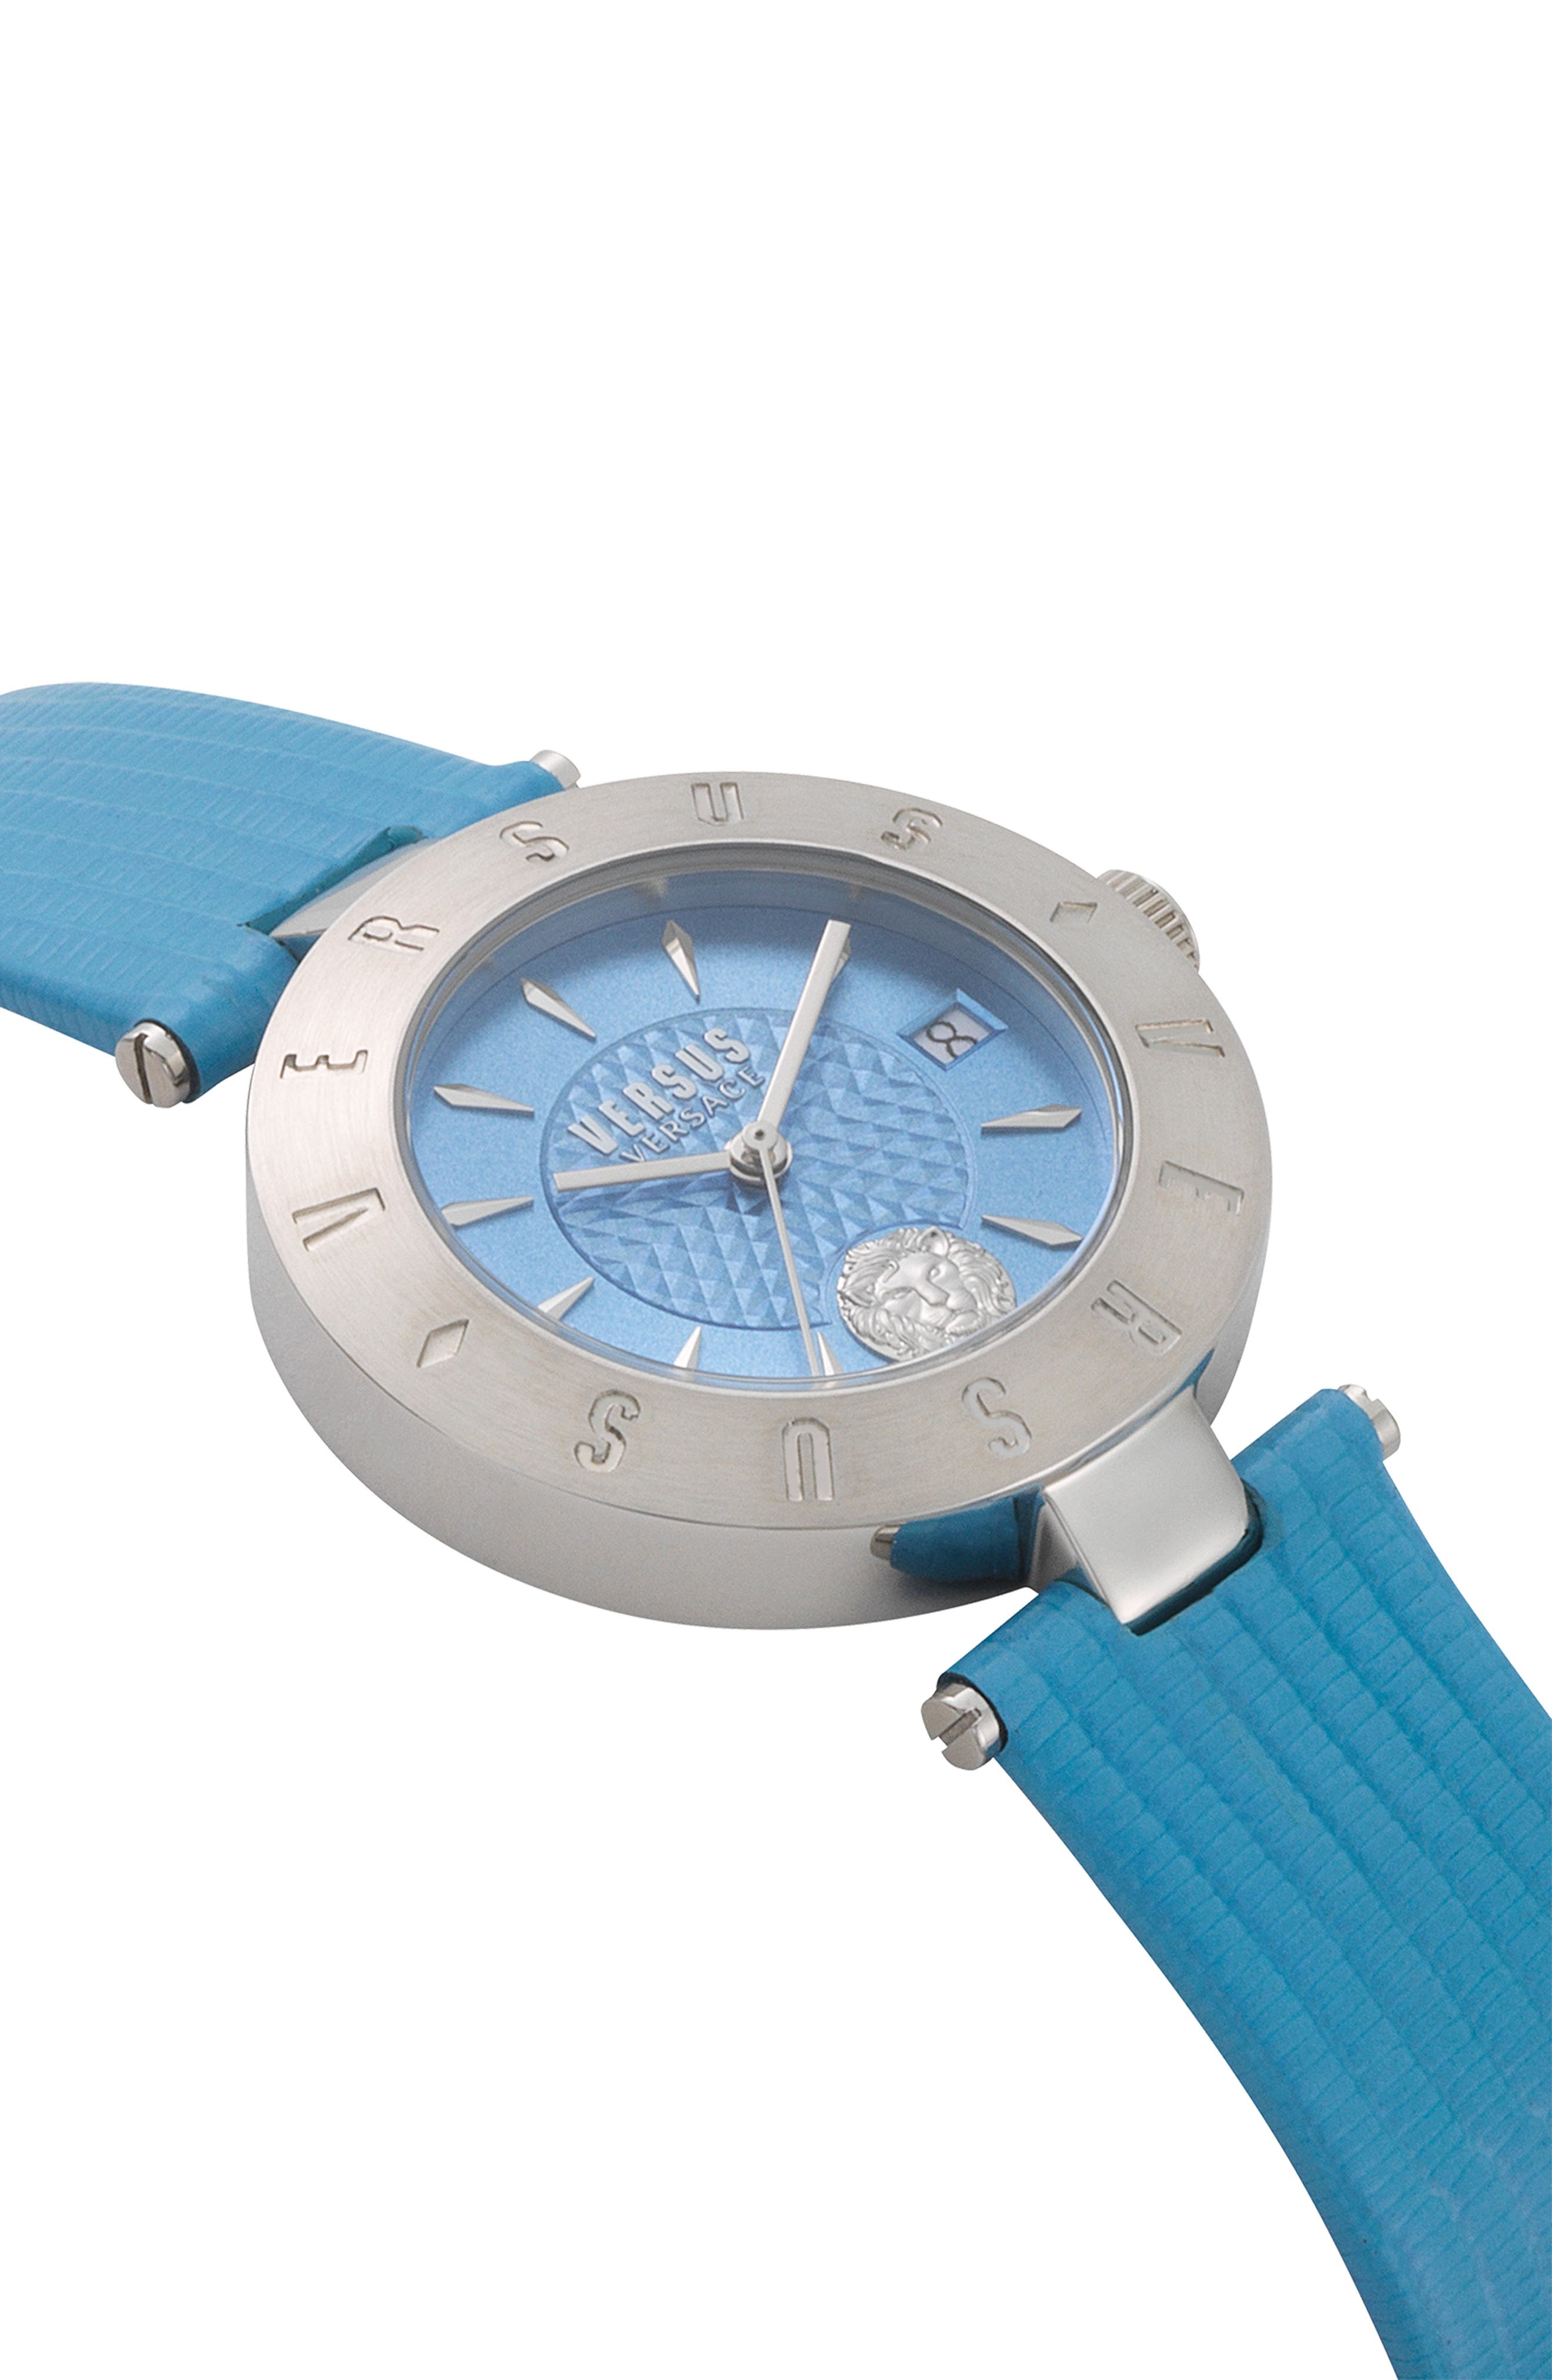 VERSUS VERSACE, Logo Leather Strap Watch, 34mm, Alternate thumbnail 3, color, BLUE/ SILVER